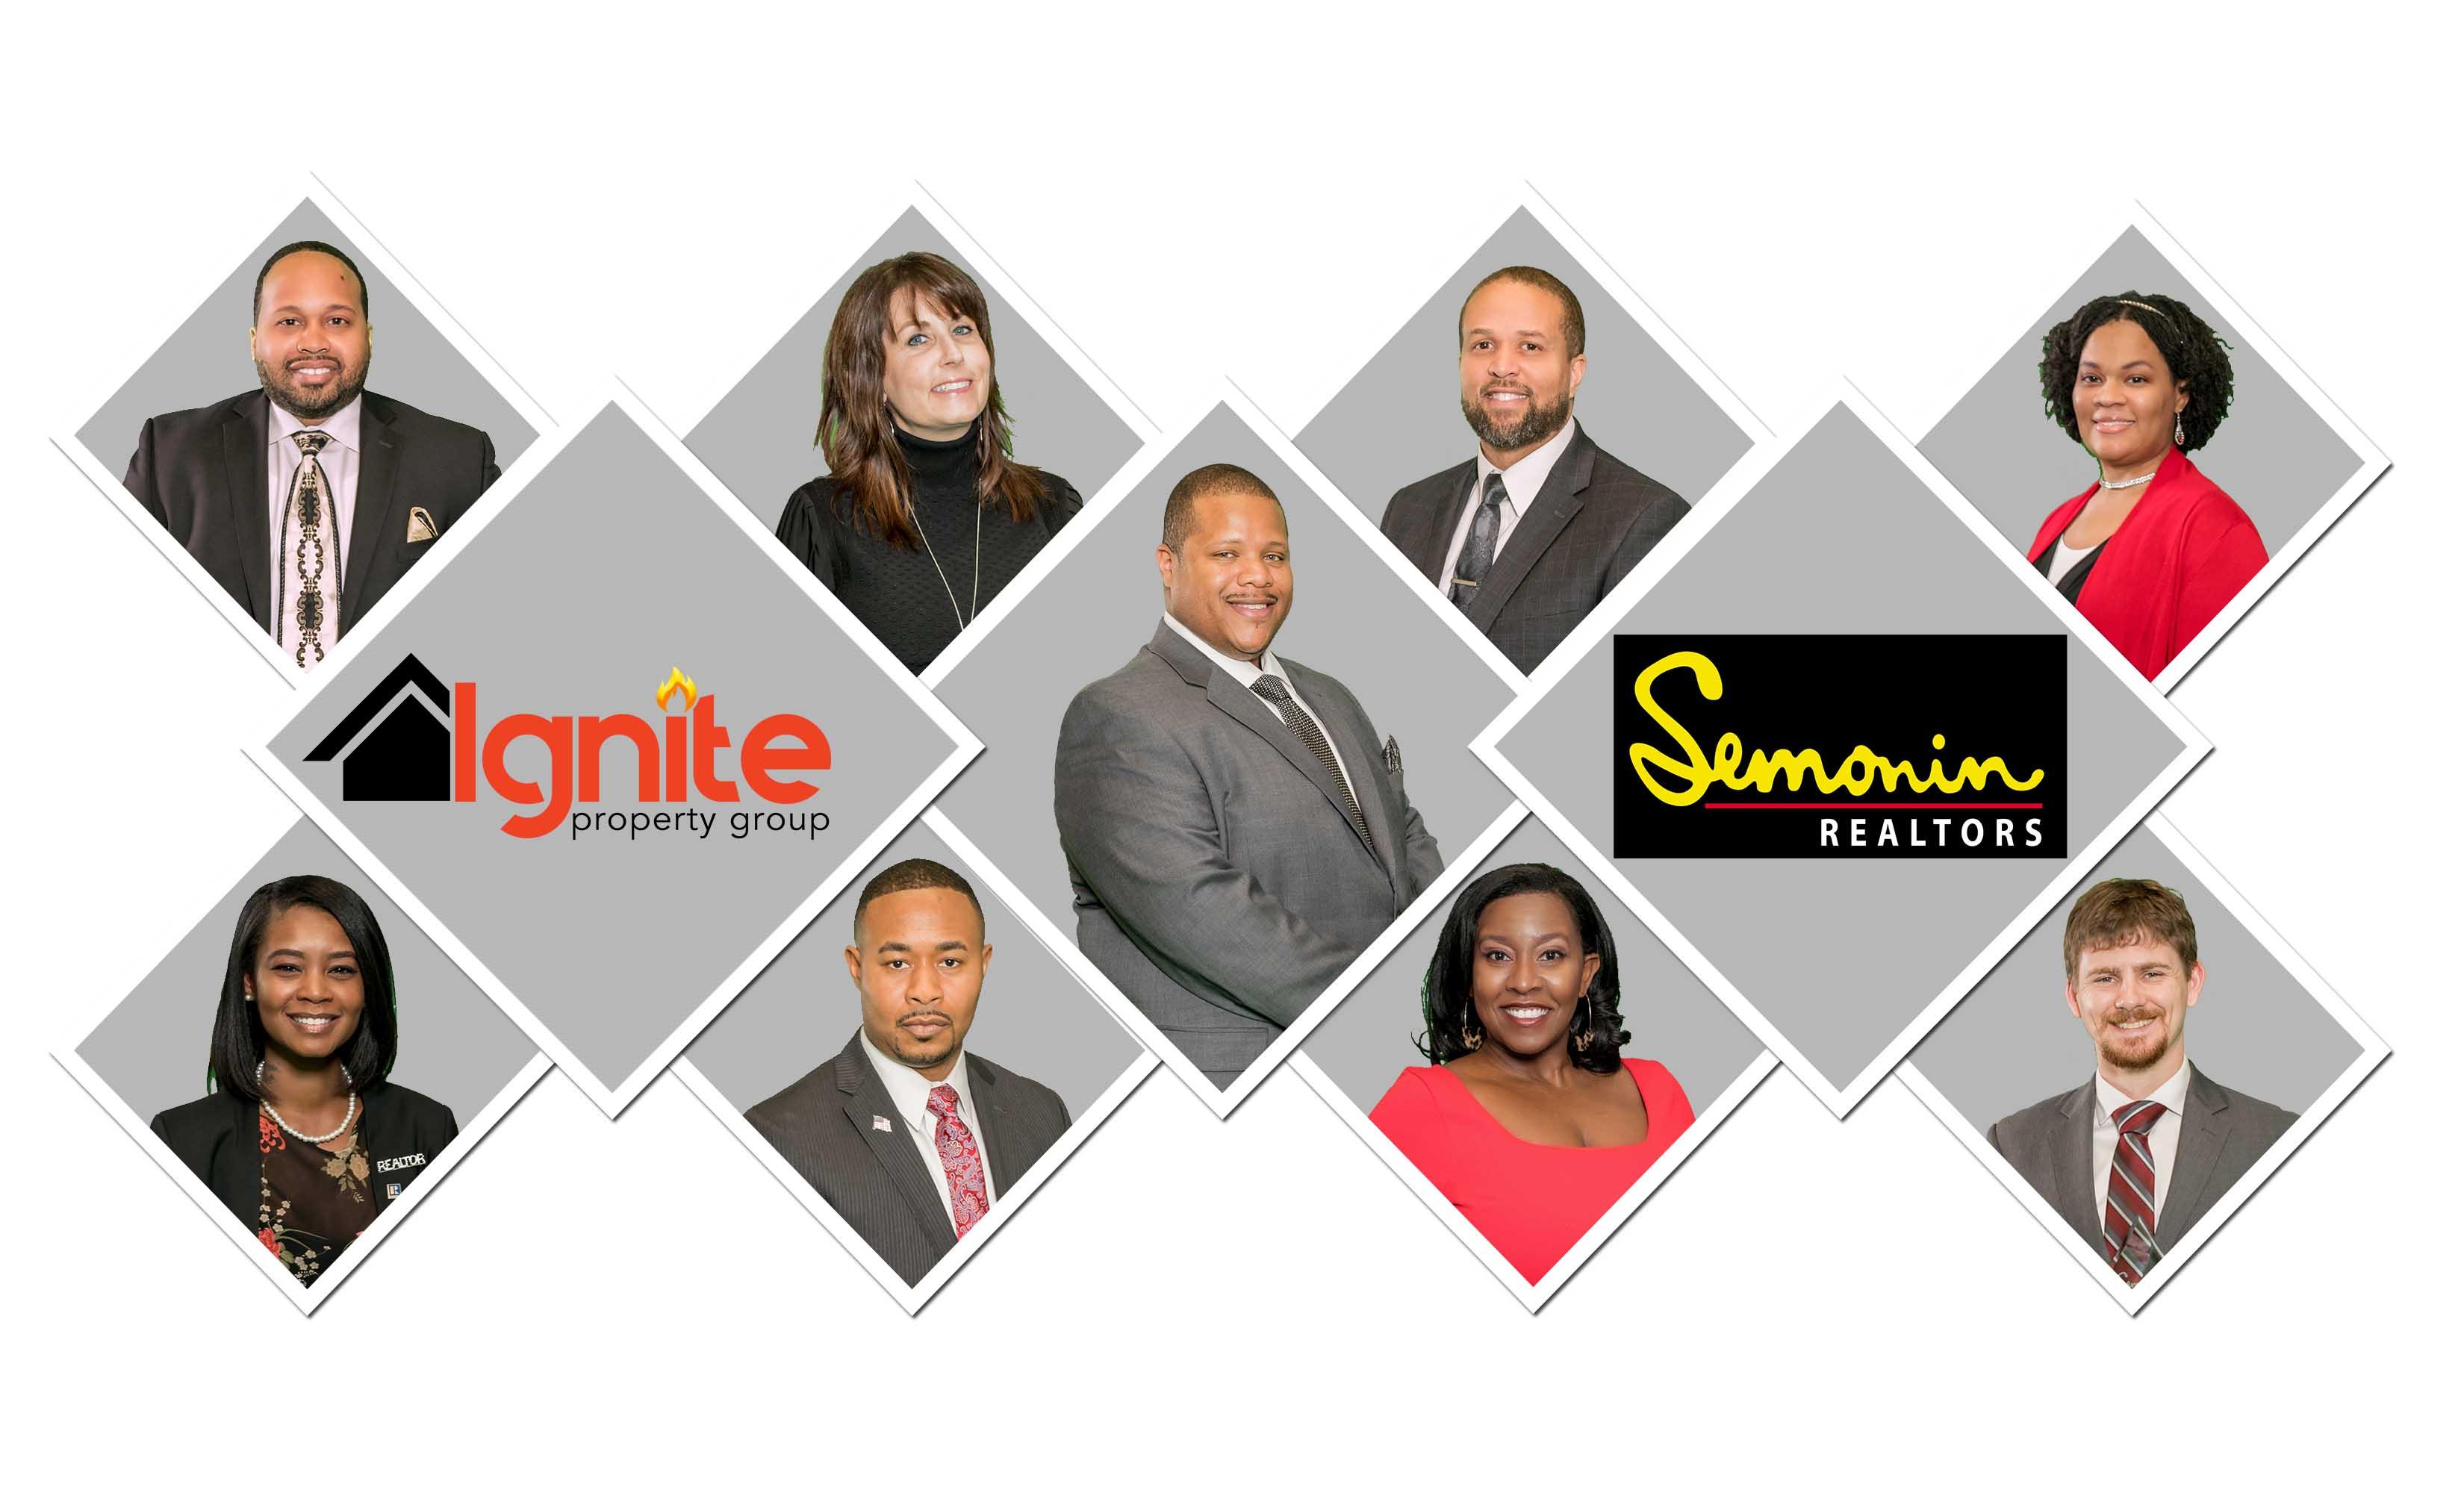 Ignite Property Group